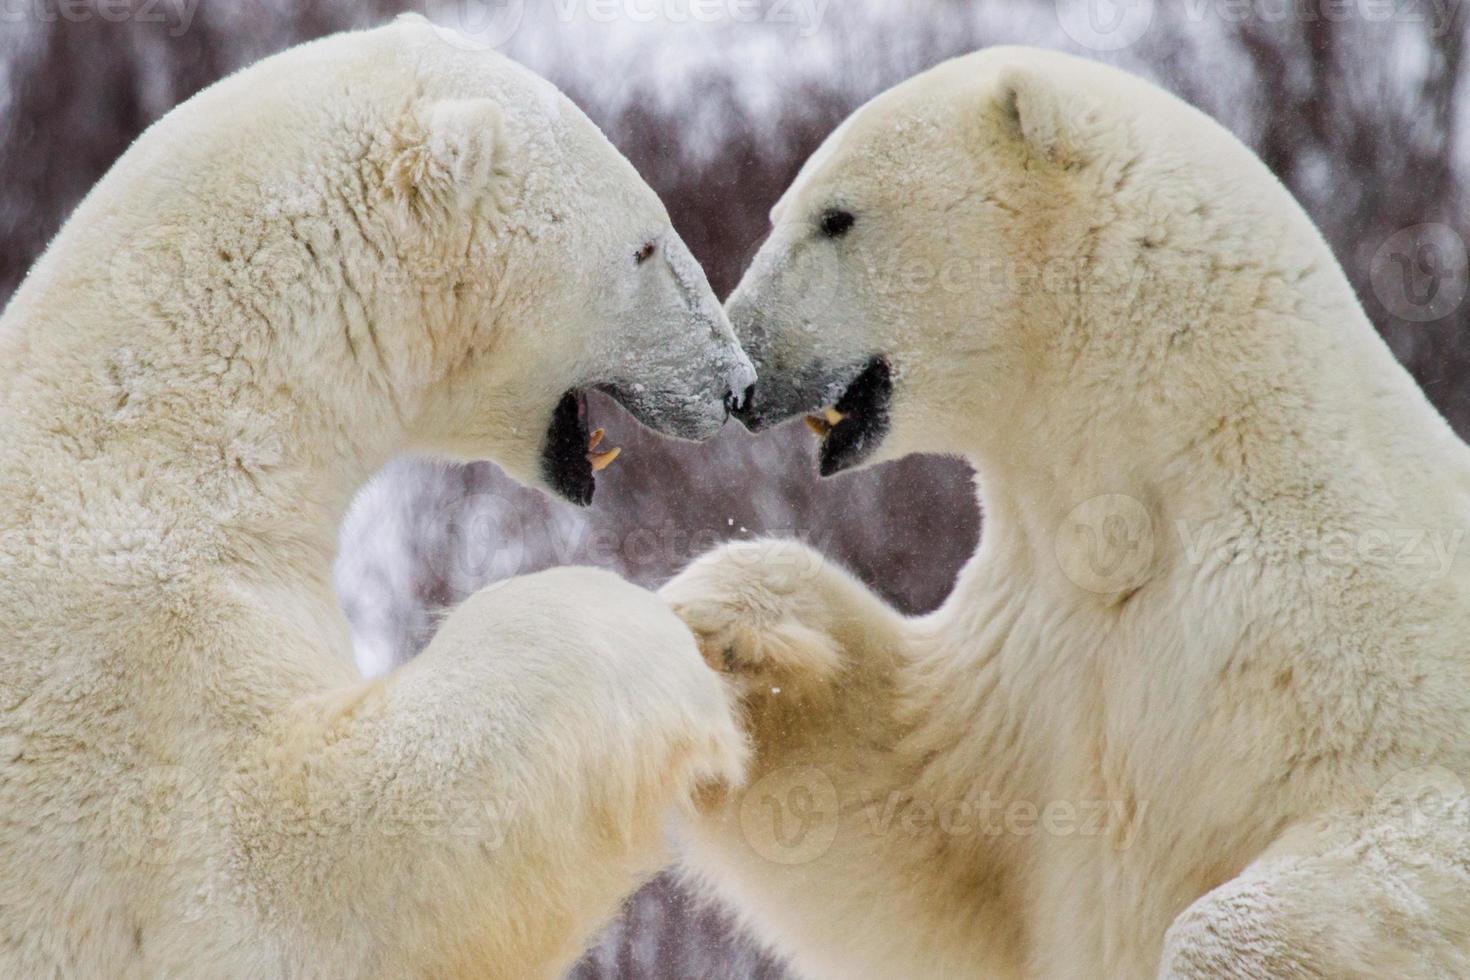 polar bear fist bump photo